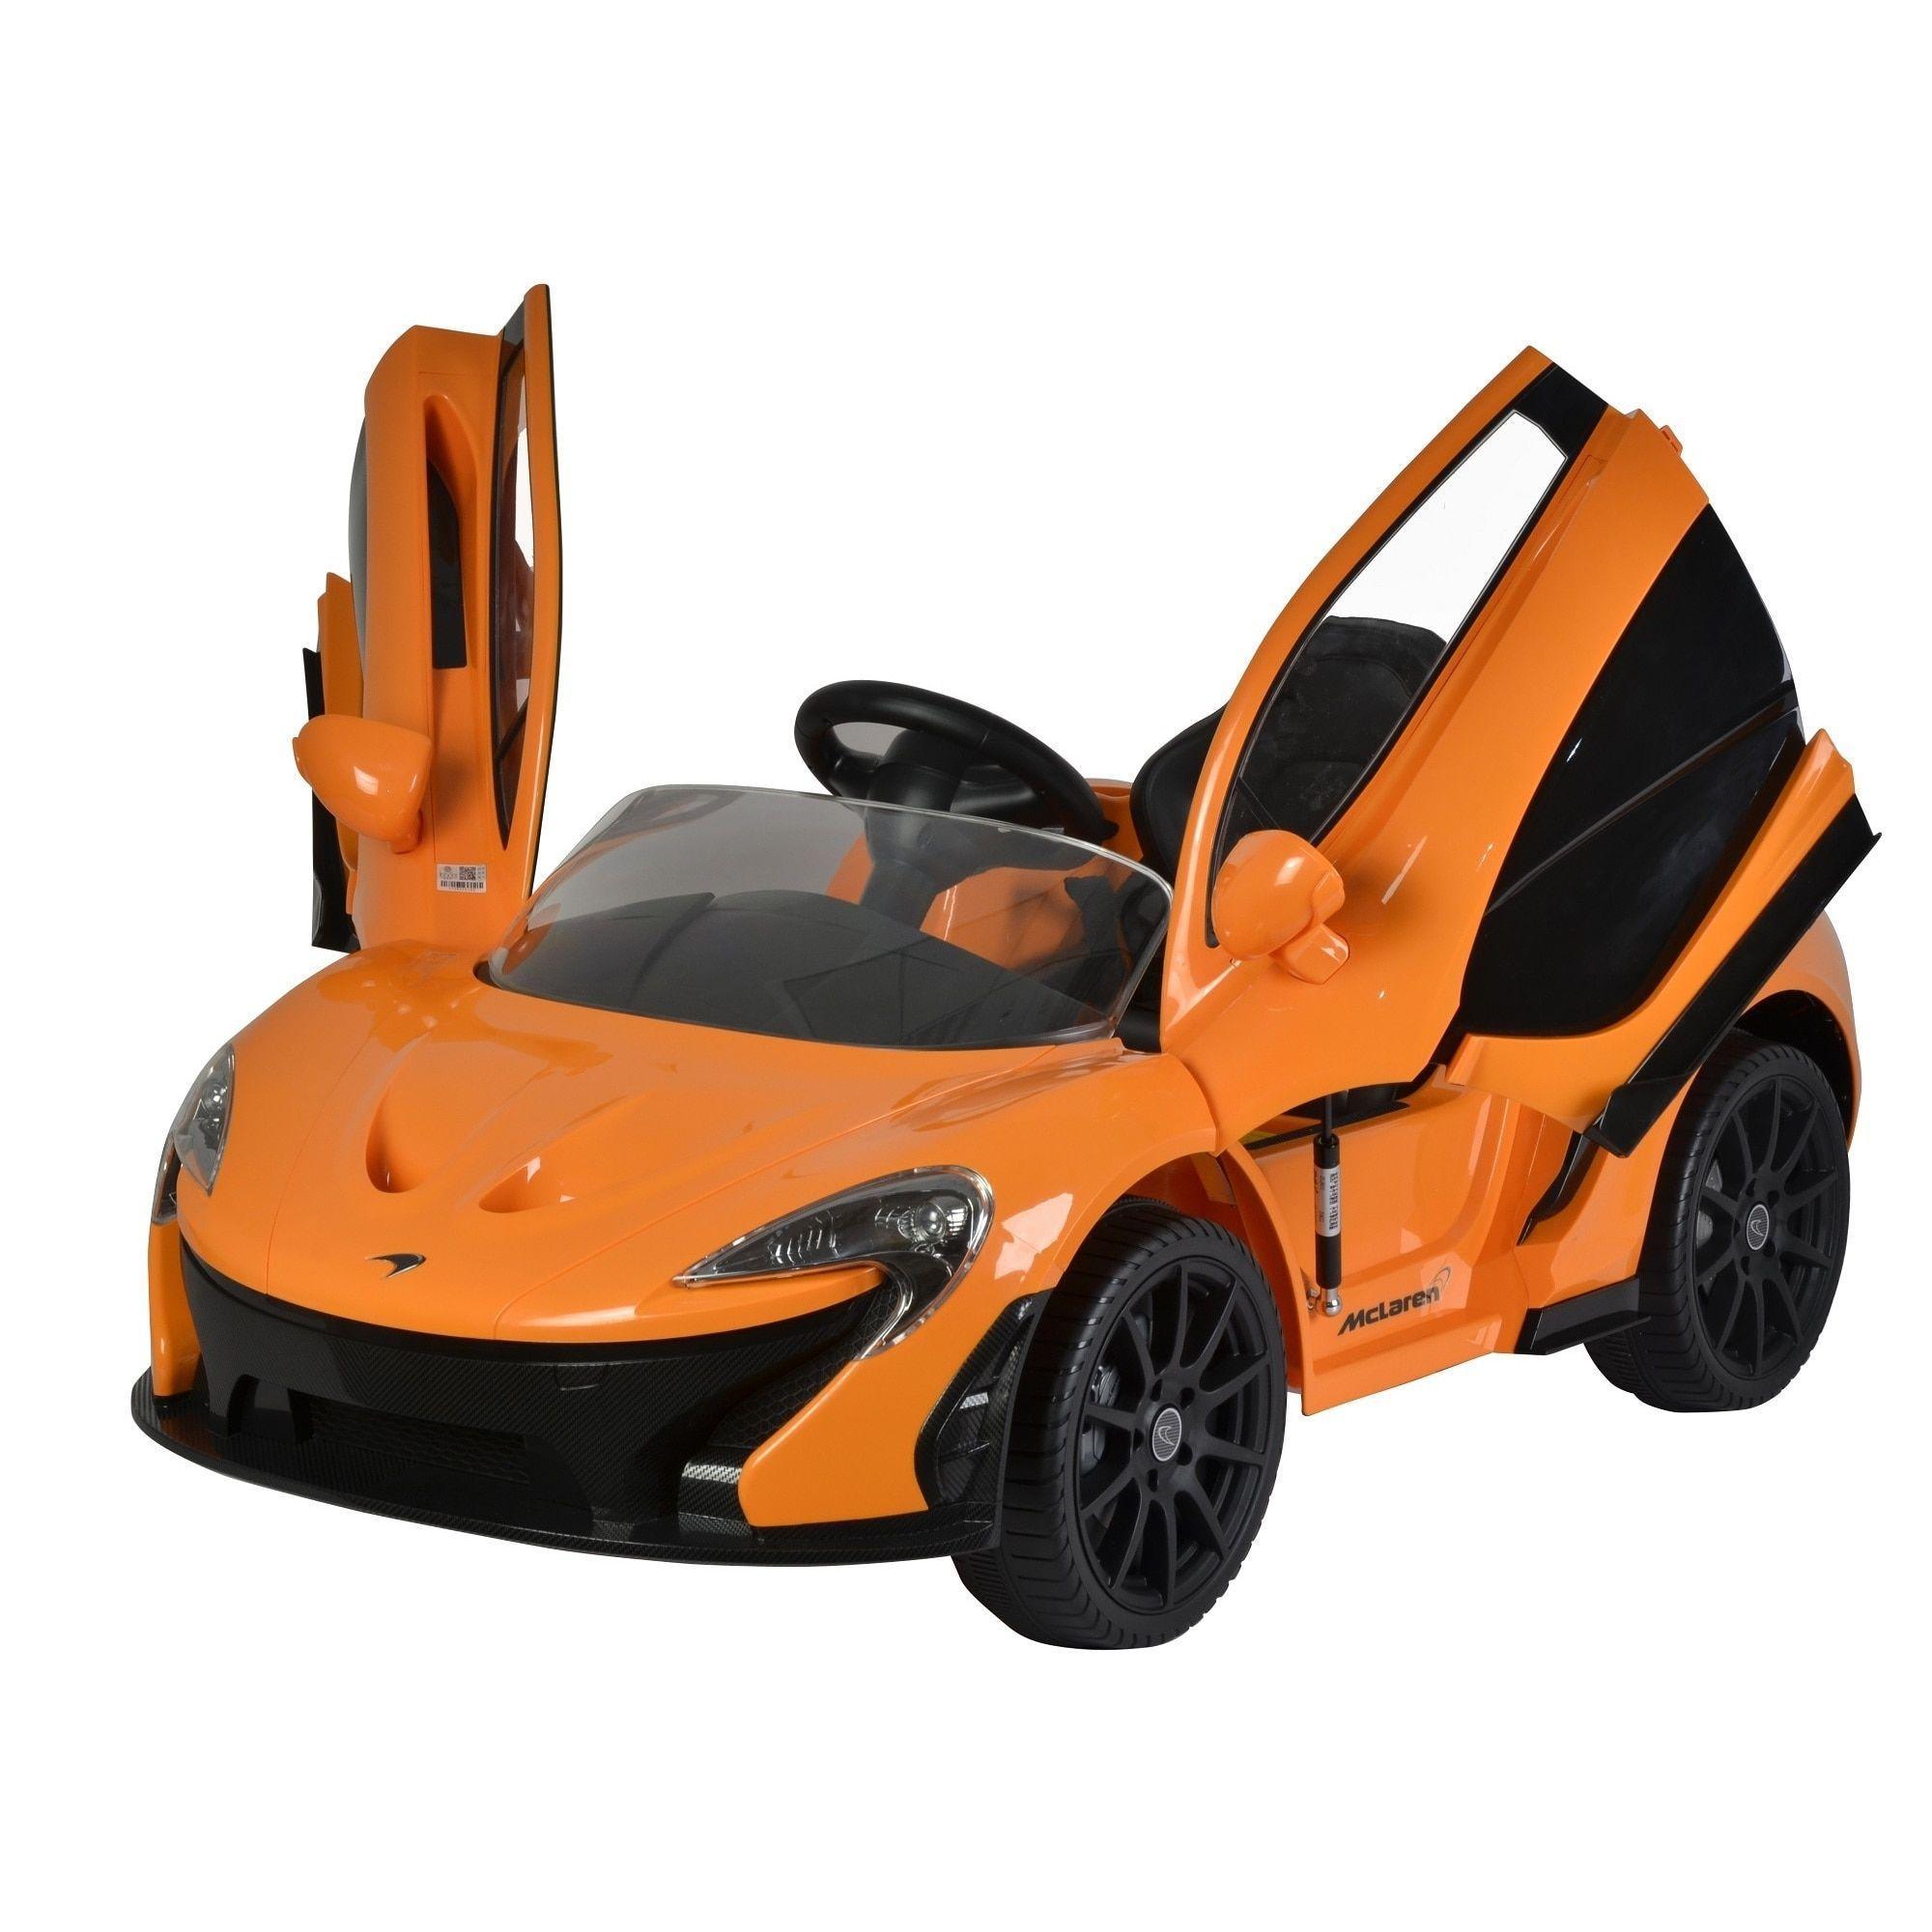 Mclaren P1 12v Power Wheel Ride On Super Car Parental: Bedding, Furniture, Electronics, Jewelry